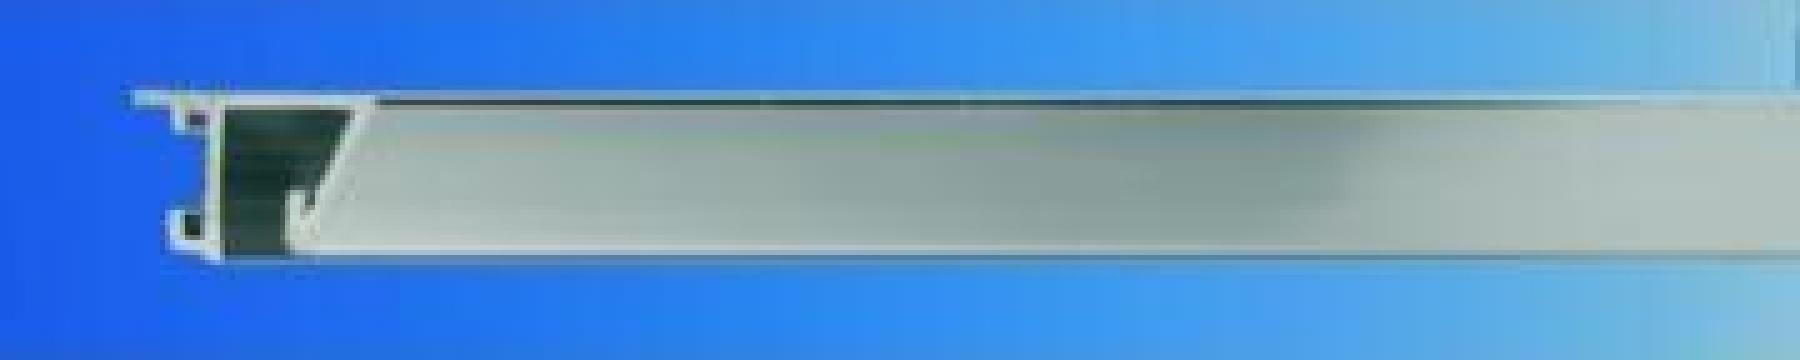 Profil din aluminiu lat A3 mat de la Frameart Decor Srl.